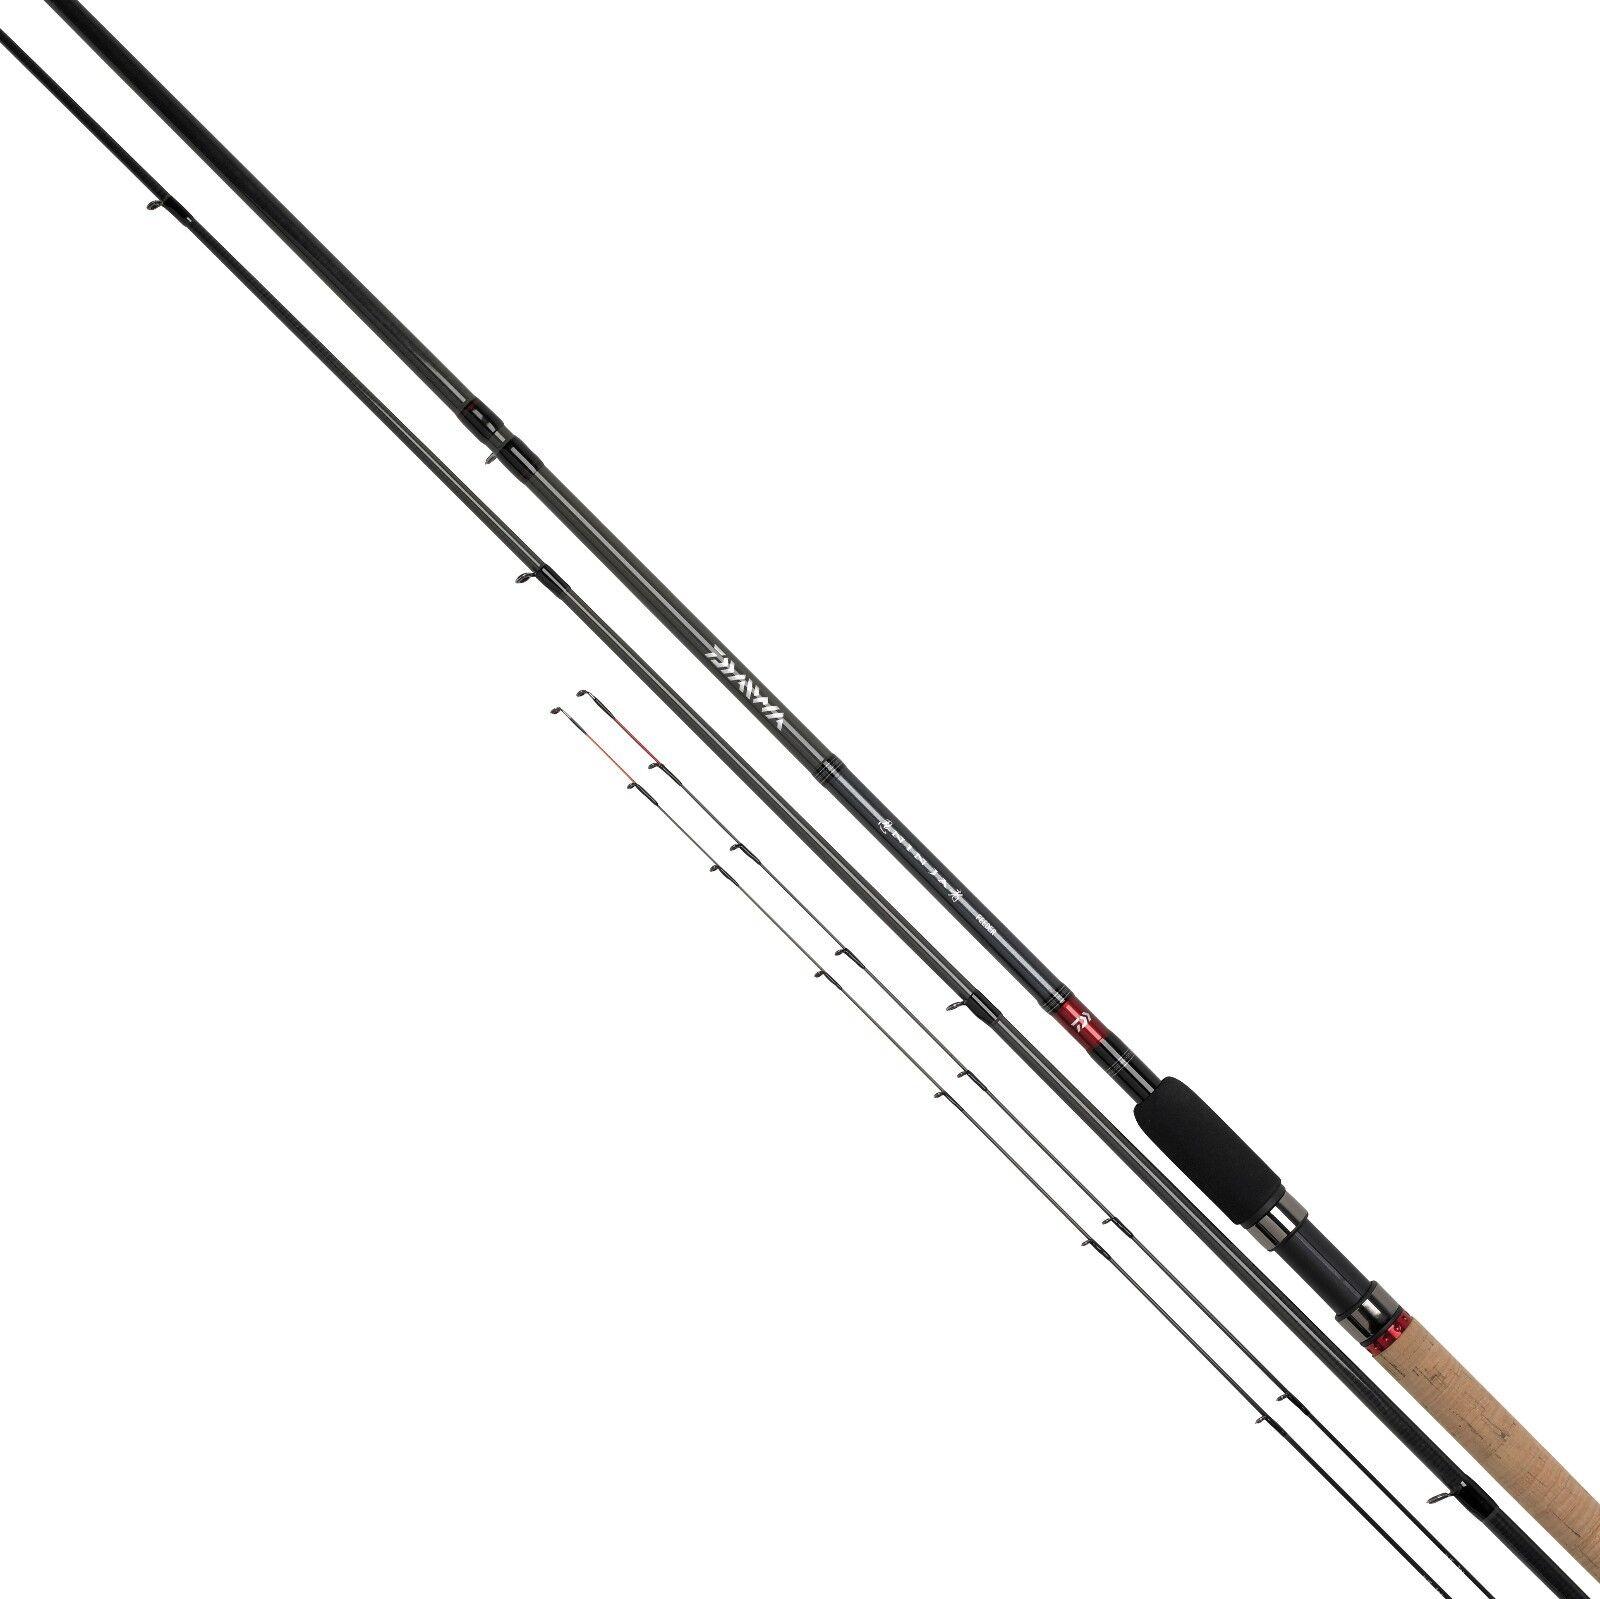 Daiwa NEW Ninja Feeder Fishing Rods 10' 11' 12' & 13' 2pc or 3pc Piece Rods